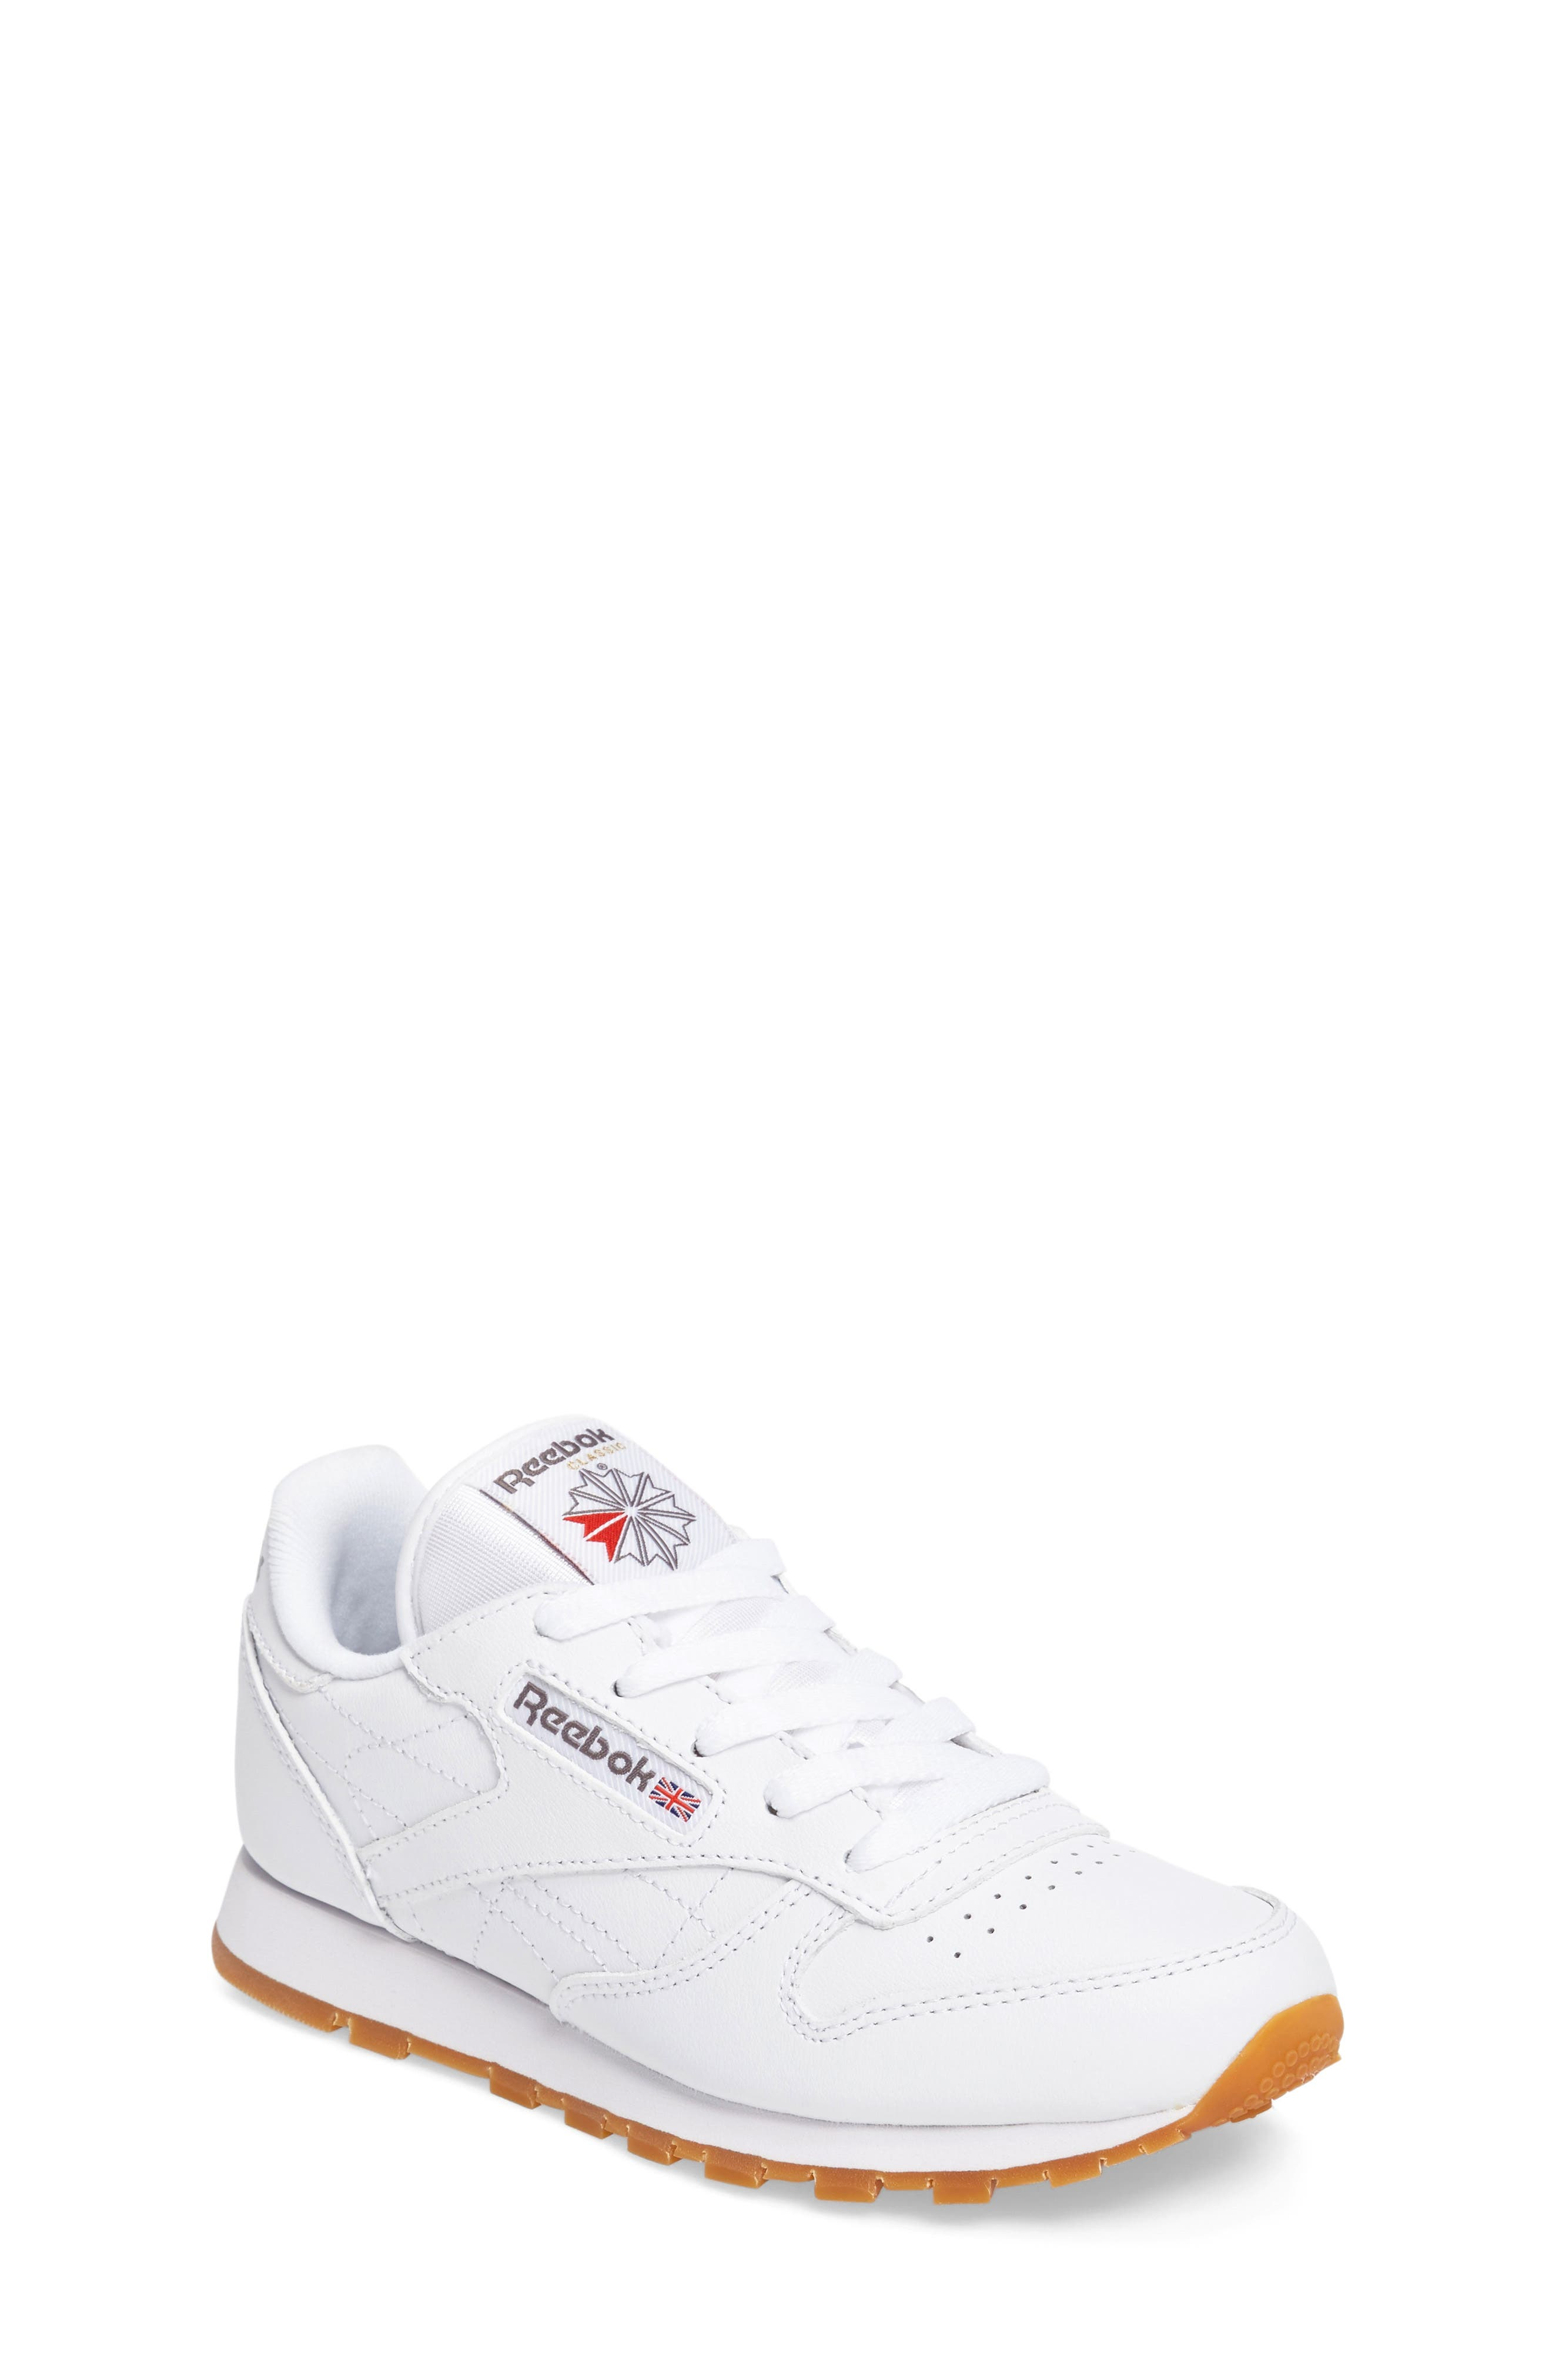 Classic Leather Sneaker,                         Main,                         color, WHITE/ GUM